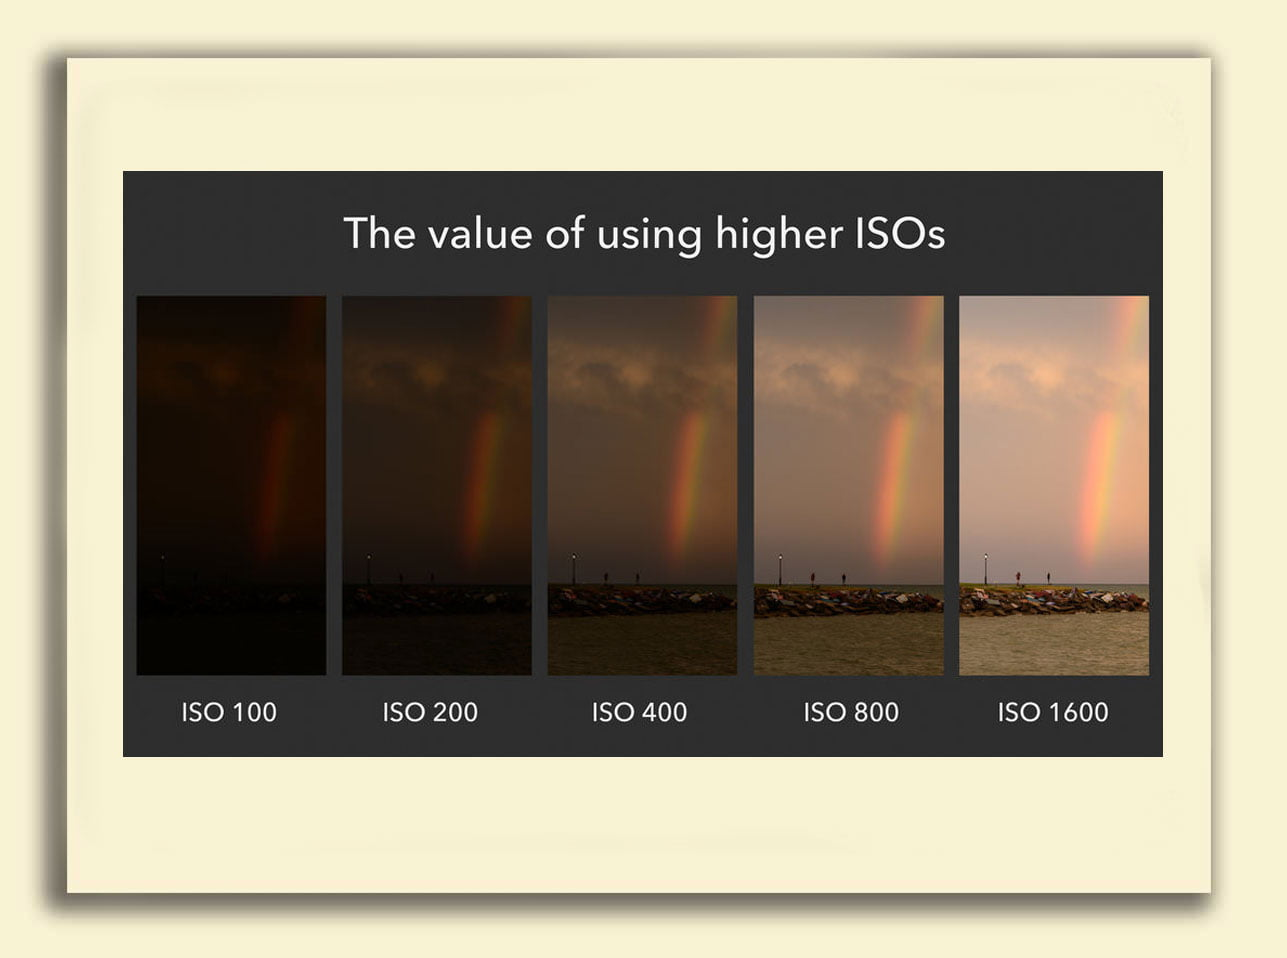 Exposure 21 - نوردهی در عکاسی چیست؟ (راهنمای مبتدیان)